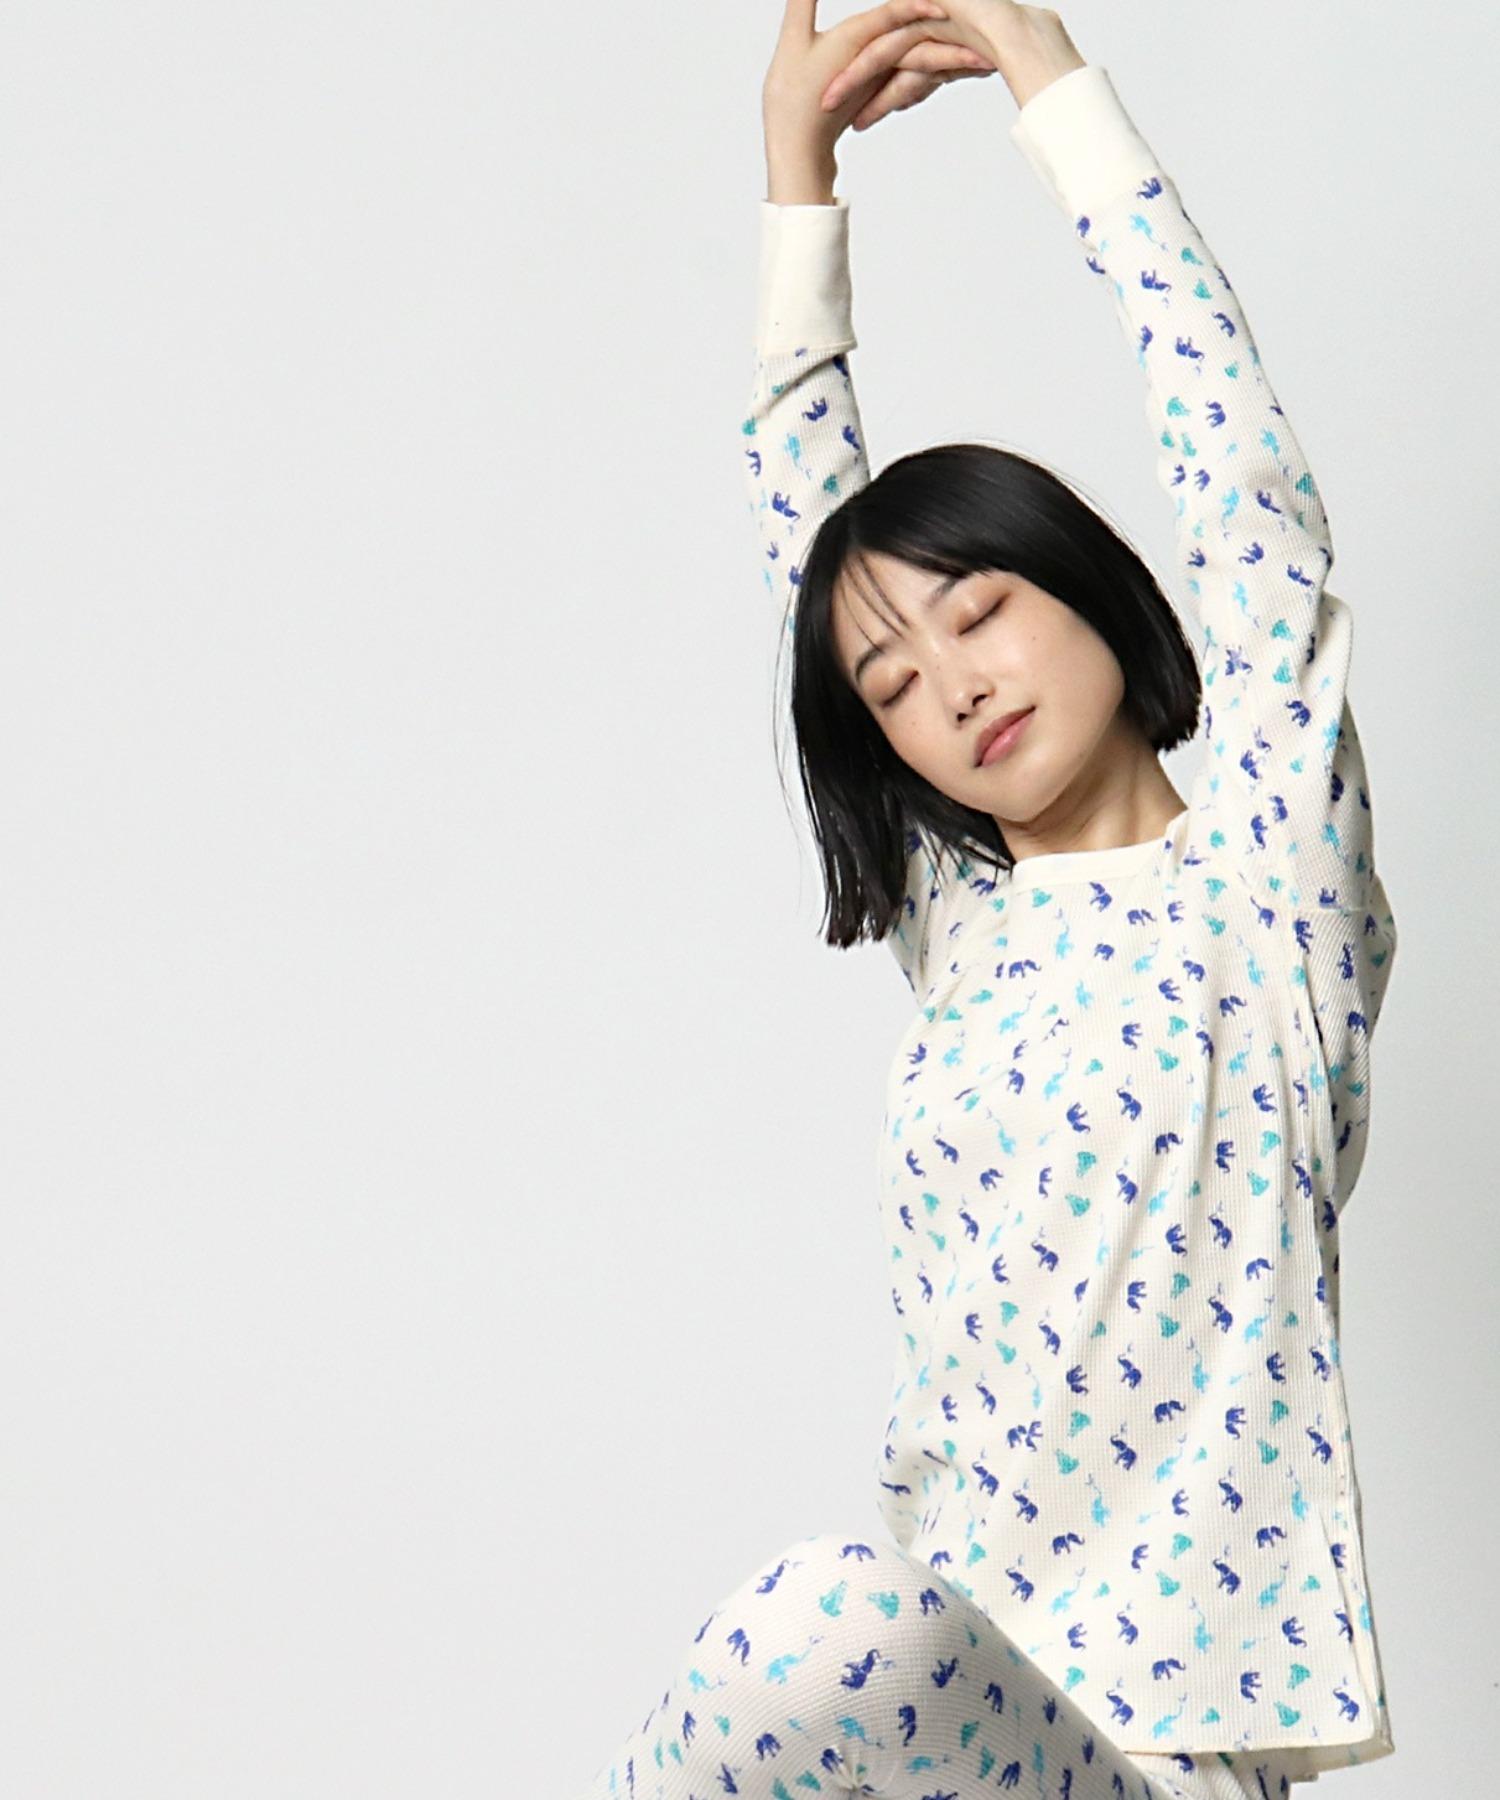 【 FRUIT OF THE LOOM / フルーツオブザルーム 】ワッフルロングTシャツ